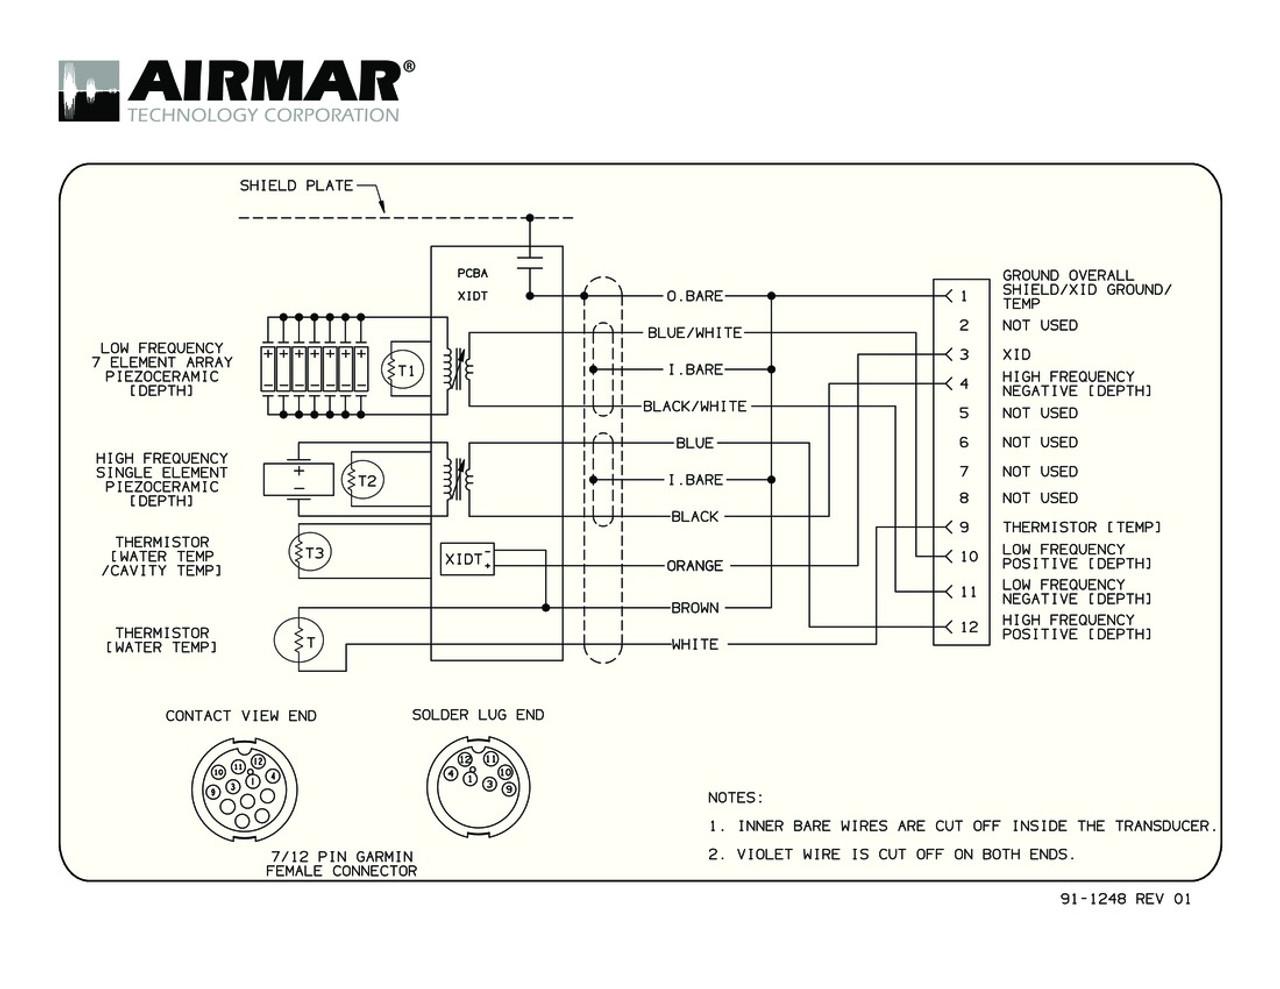 medium resolution of airmar wiring diagram cm275 blue bottle marine transducer for lowrance wiring diagrams transducer wiring diagram